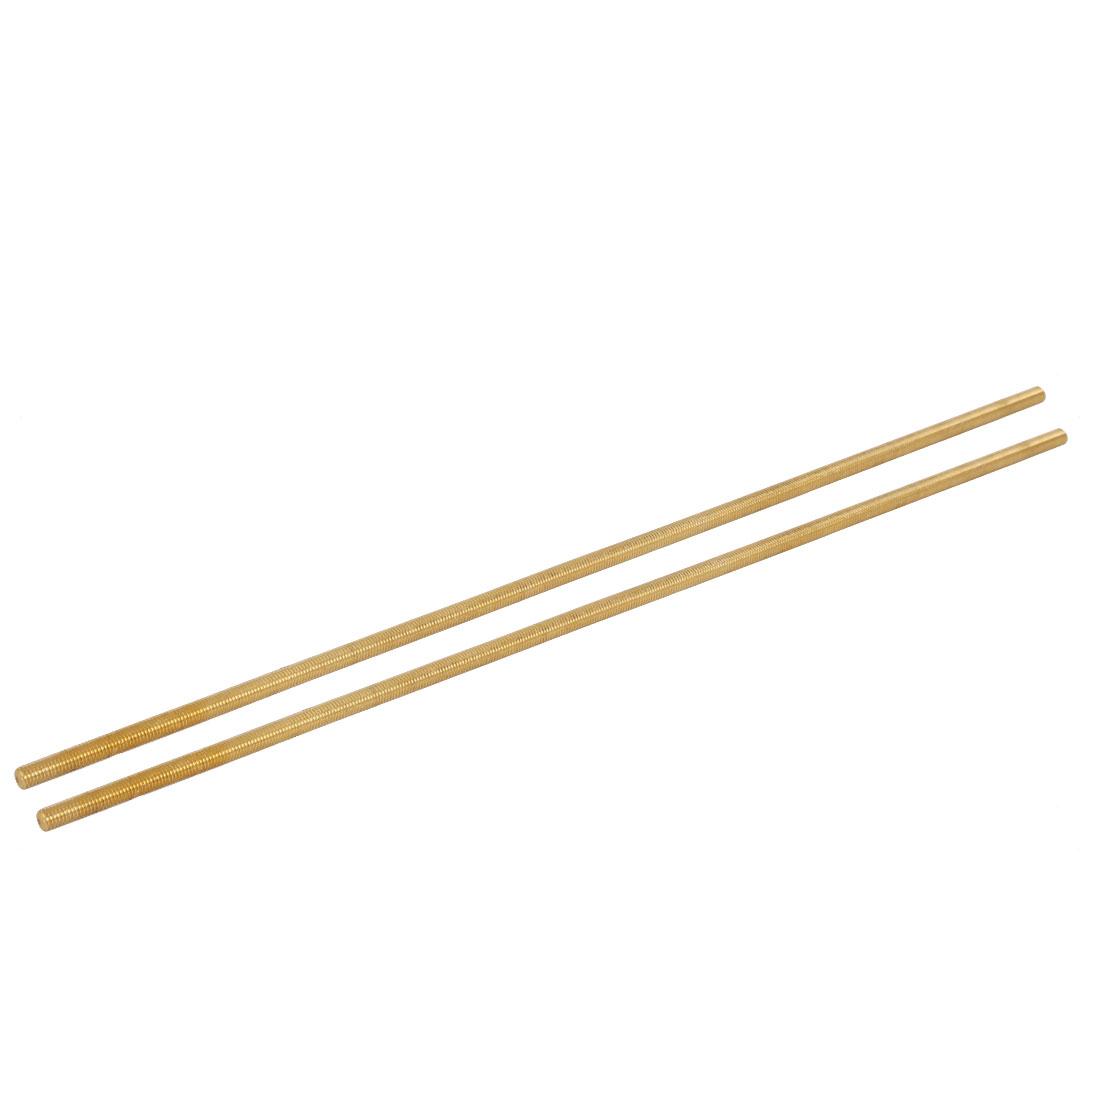 M8 x 500mm Male Threaded 1.25mm Pitch Full Thread Brass Rod Bar Fastener 2 Pcs